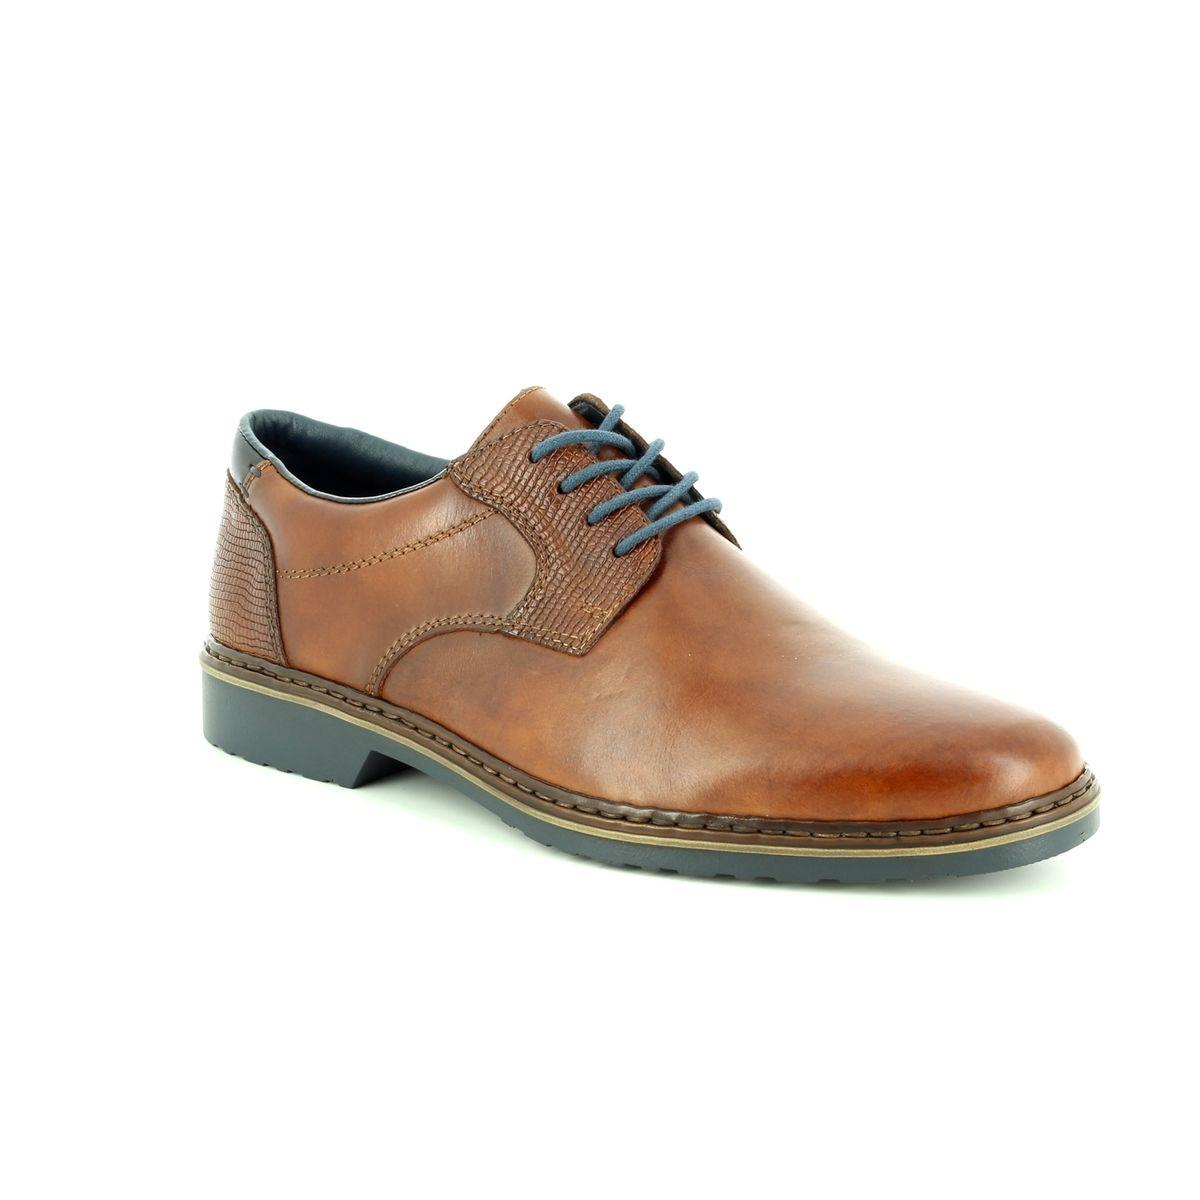 9abfe3b8ba4 Rieker Formal Shoes - Tan multi - 16541-25 ADAM